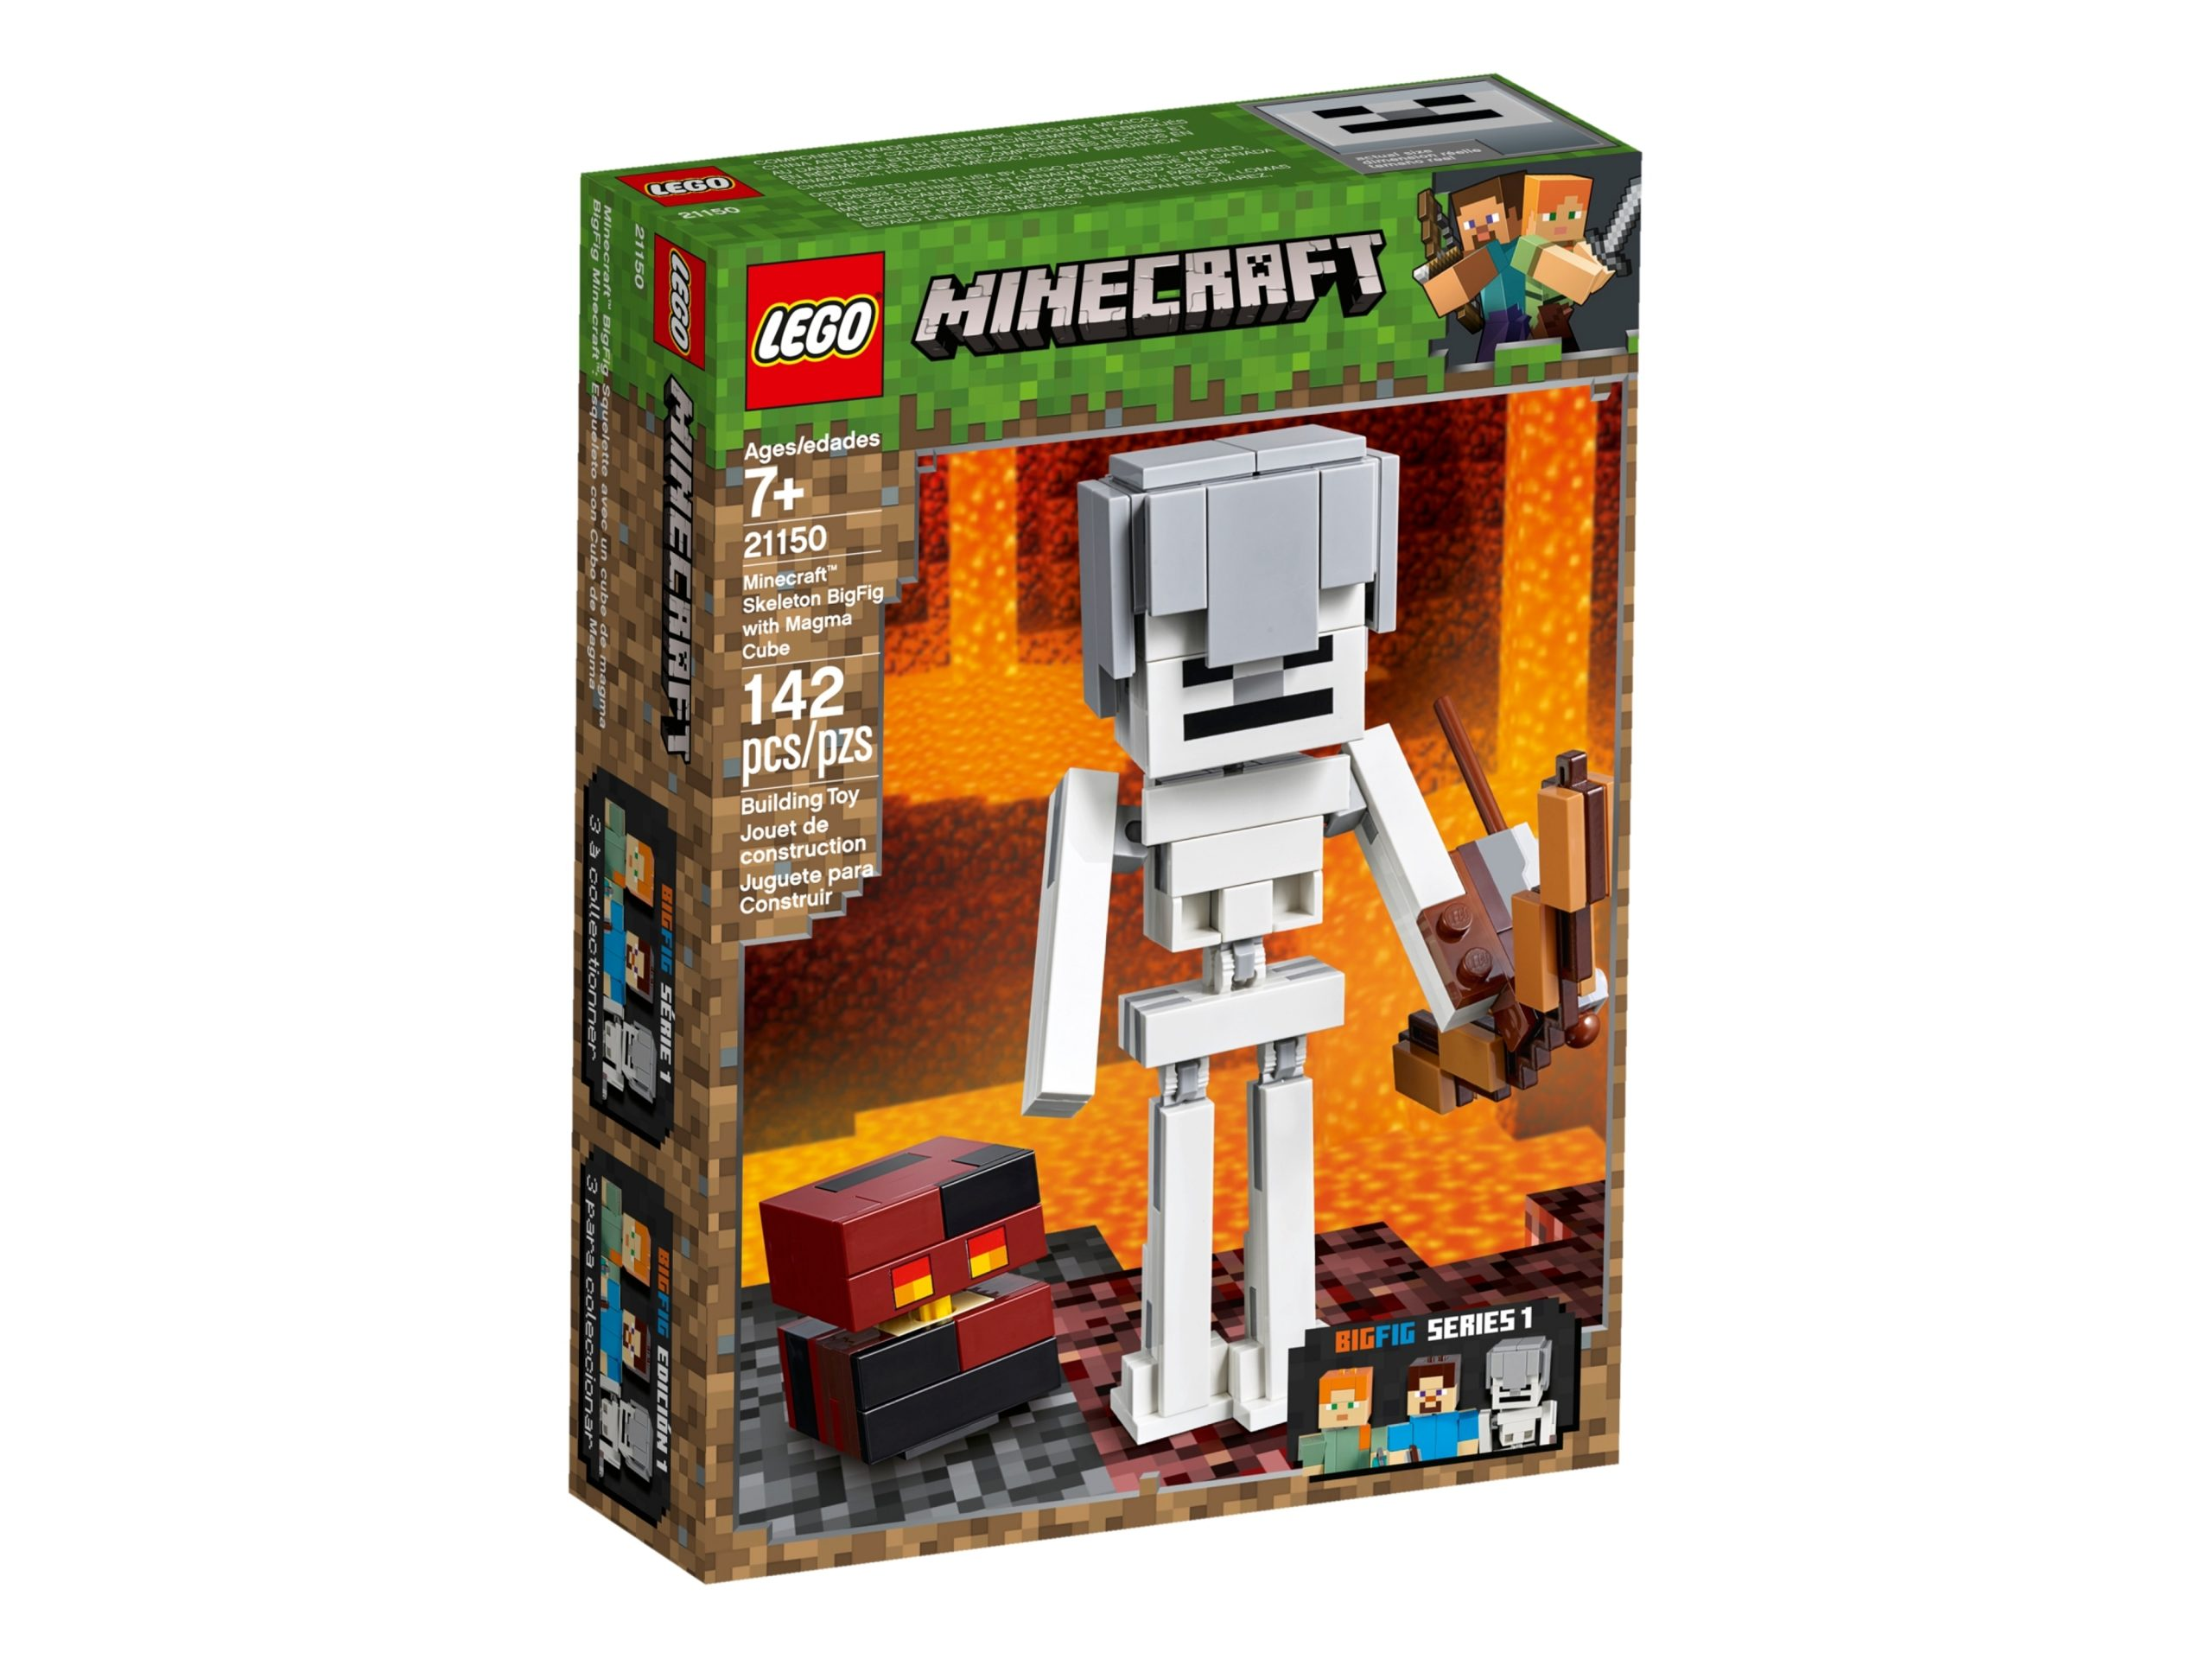 lego 21150 stor skeletfigur med magmakubus scaled